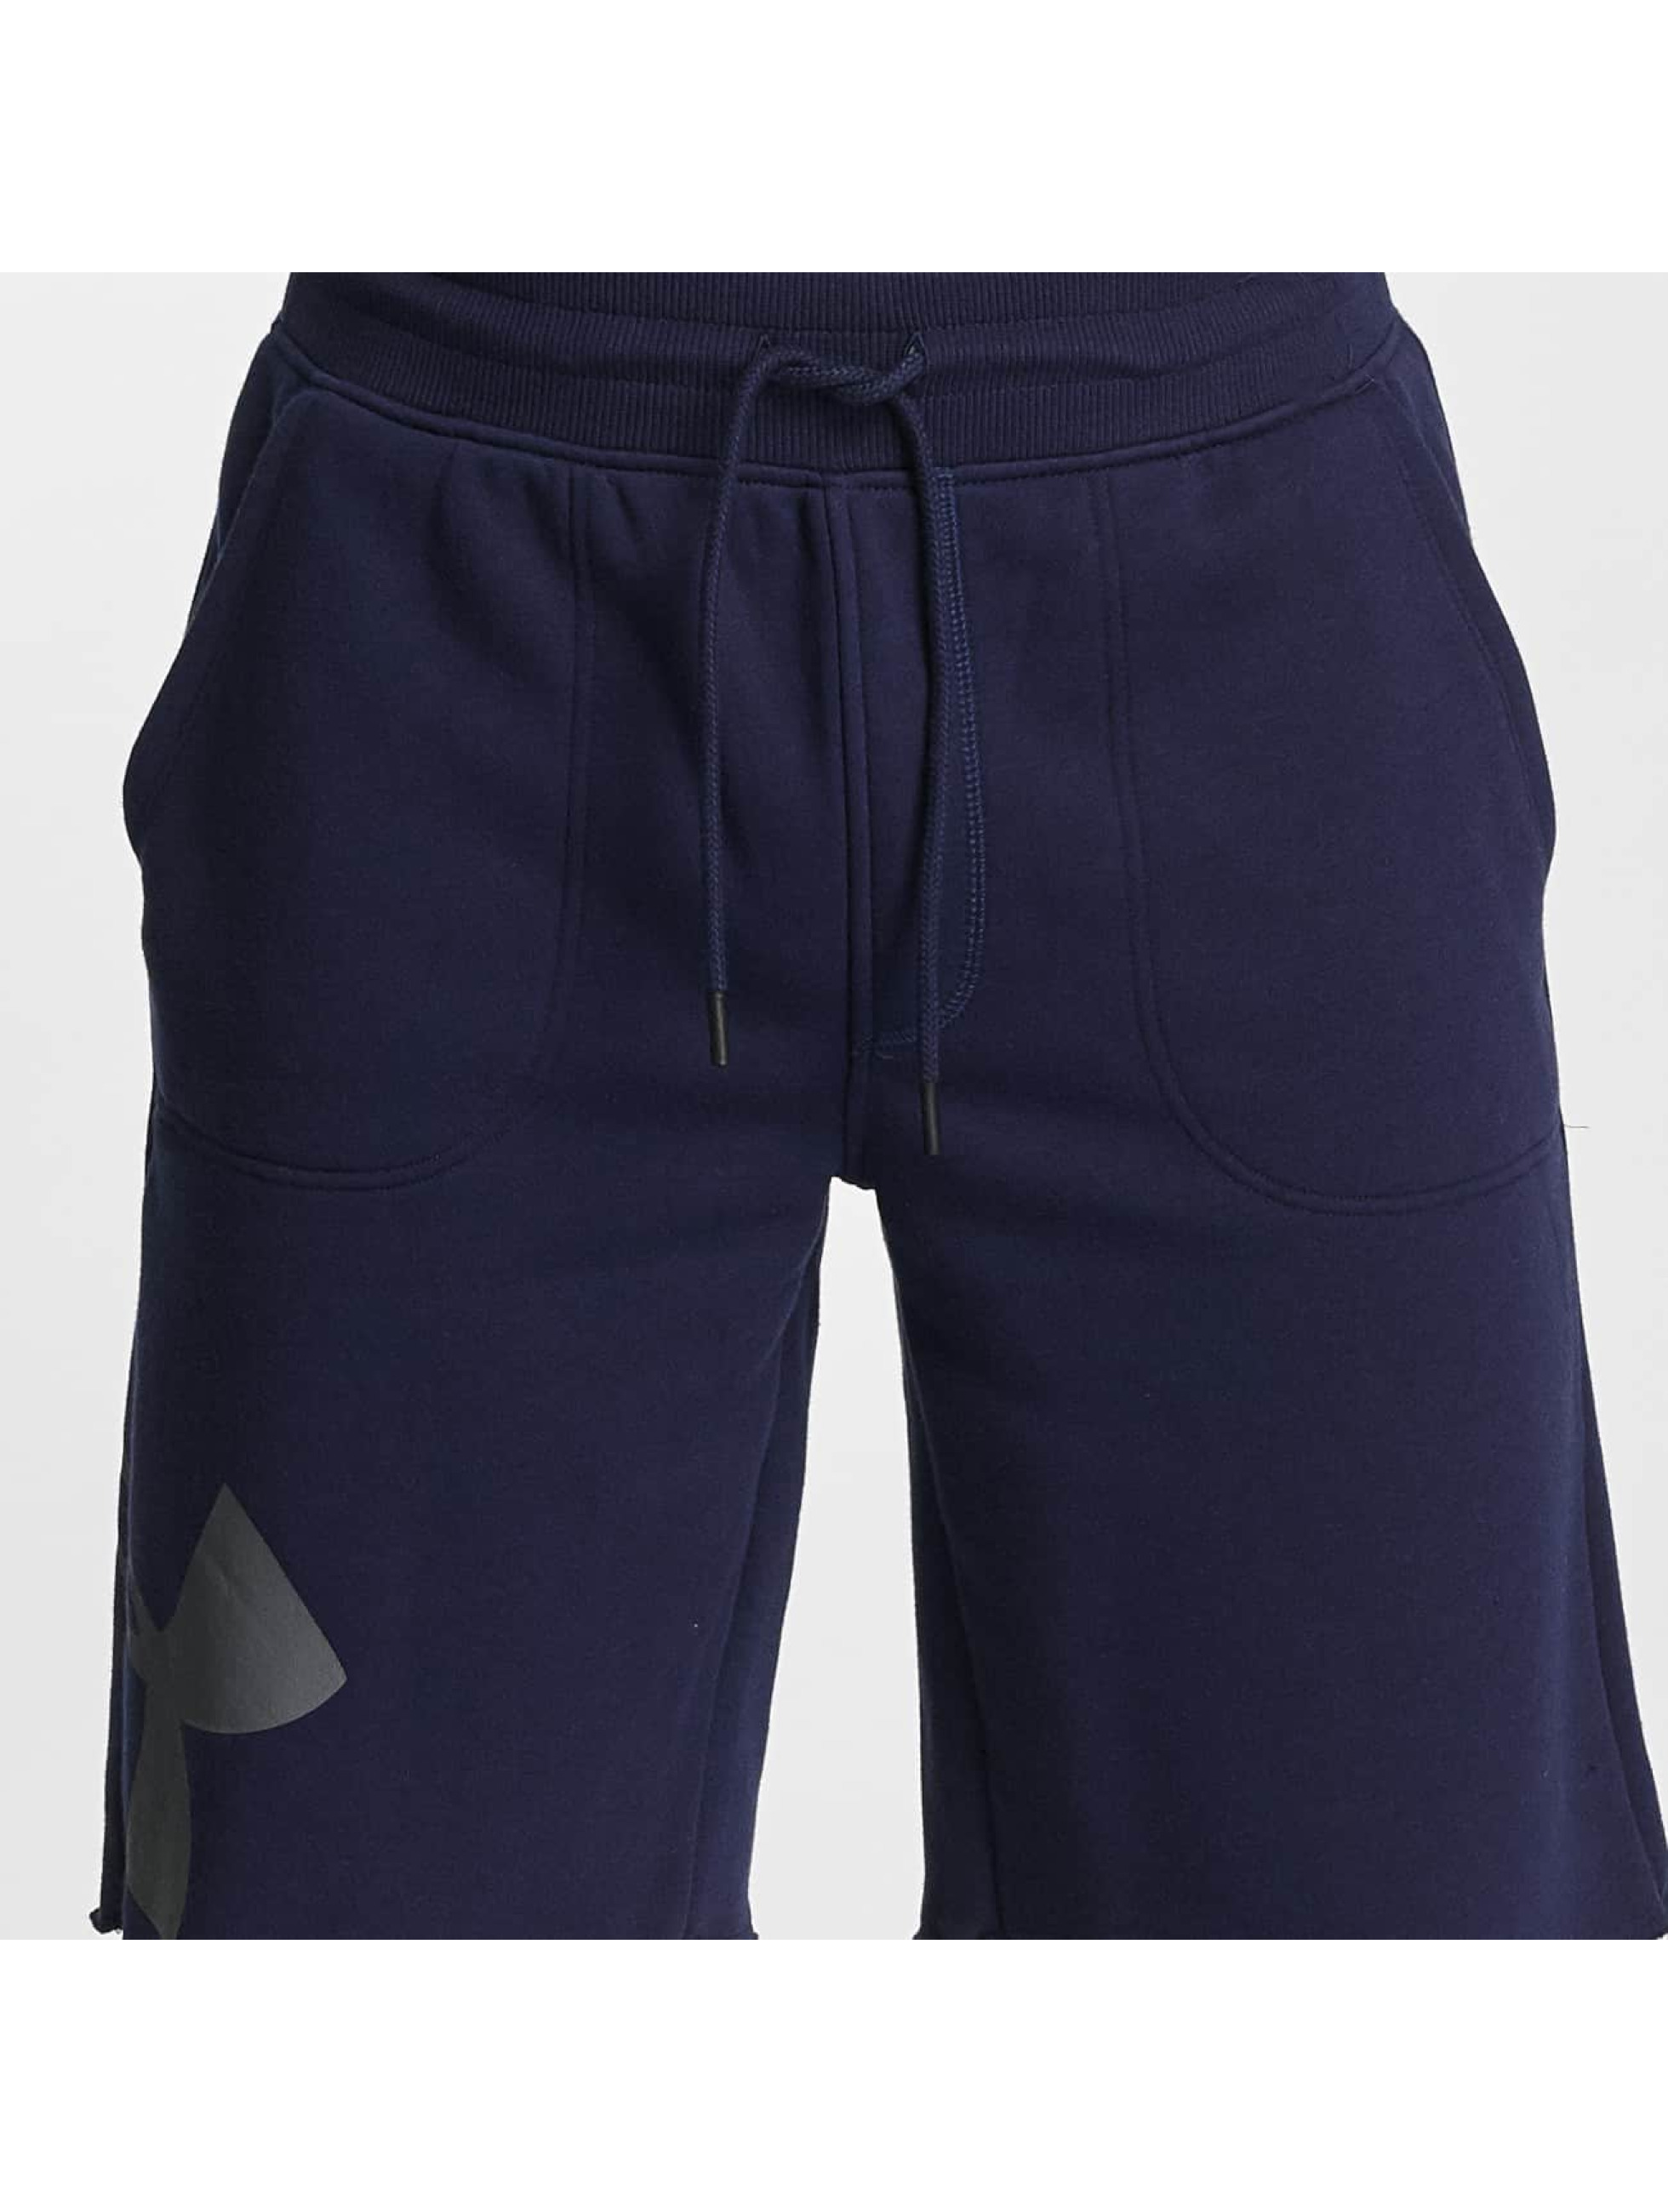 Under Armour Shorts Rival blå